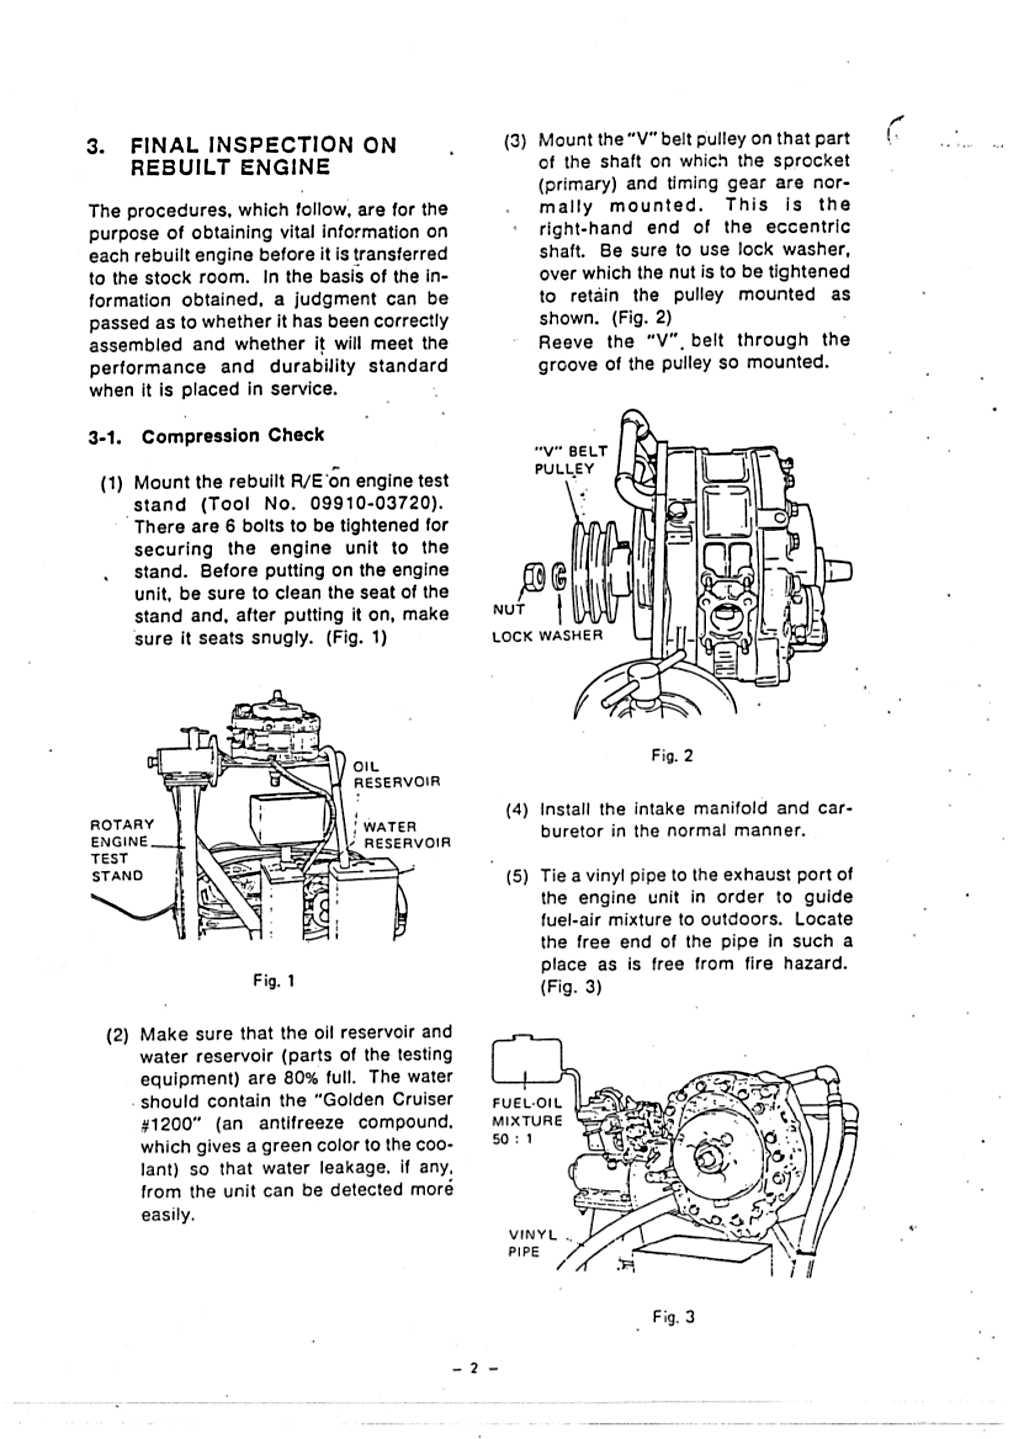 ... Array - kenmore 385 sewing machine manual 385 17828490 ebook rh kenmore  385 sewing machine manual